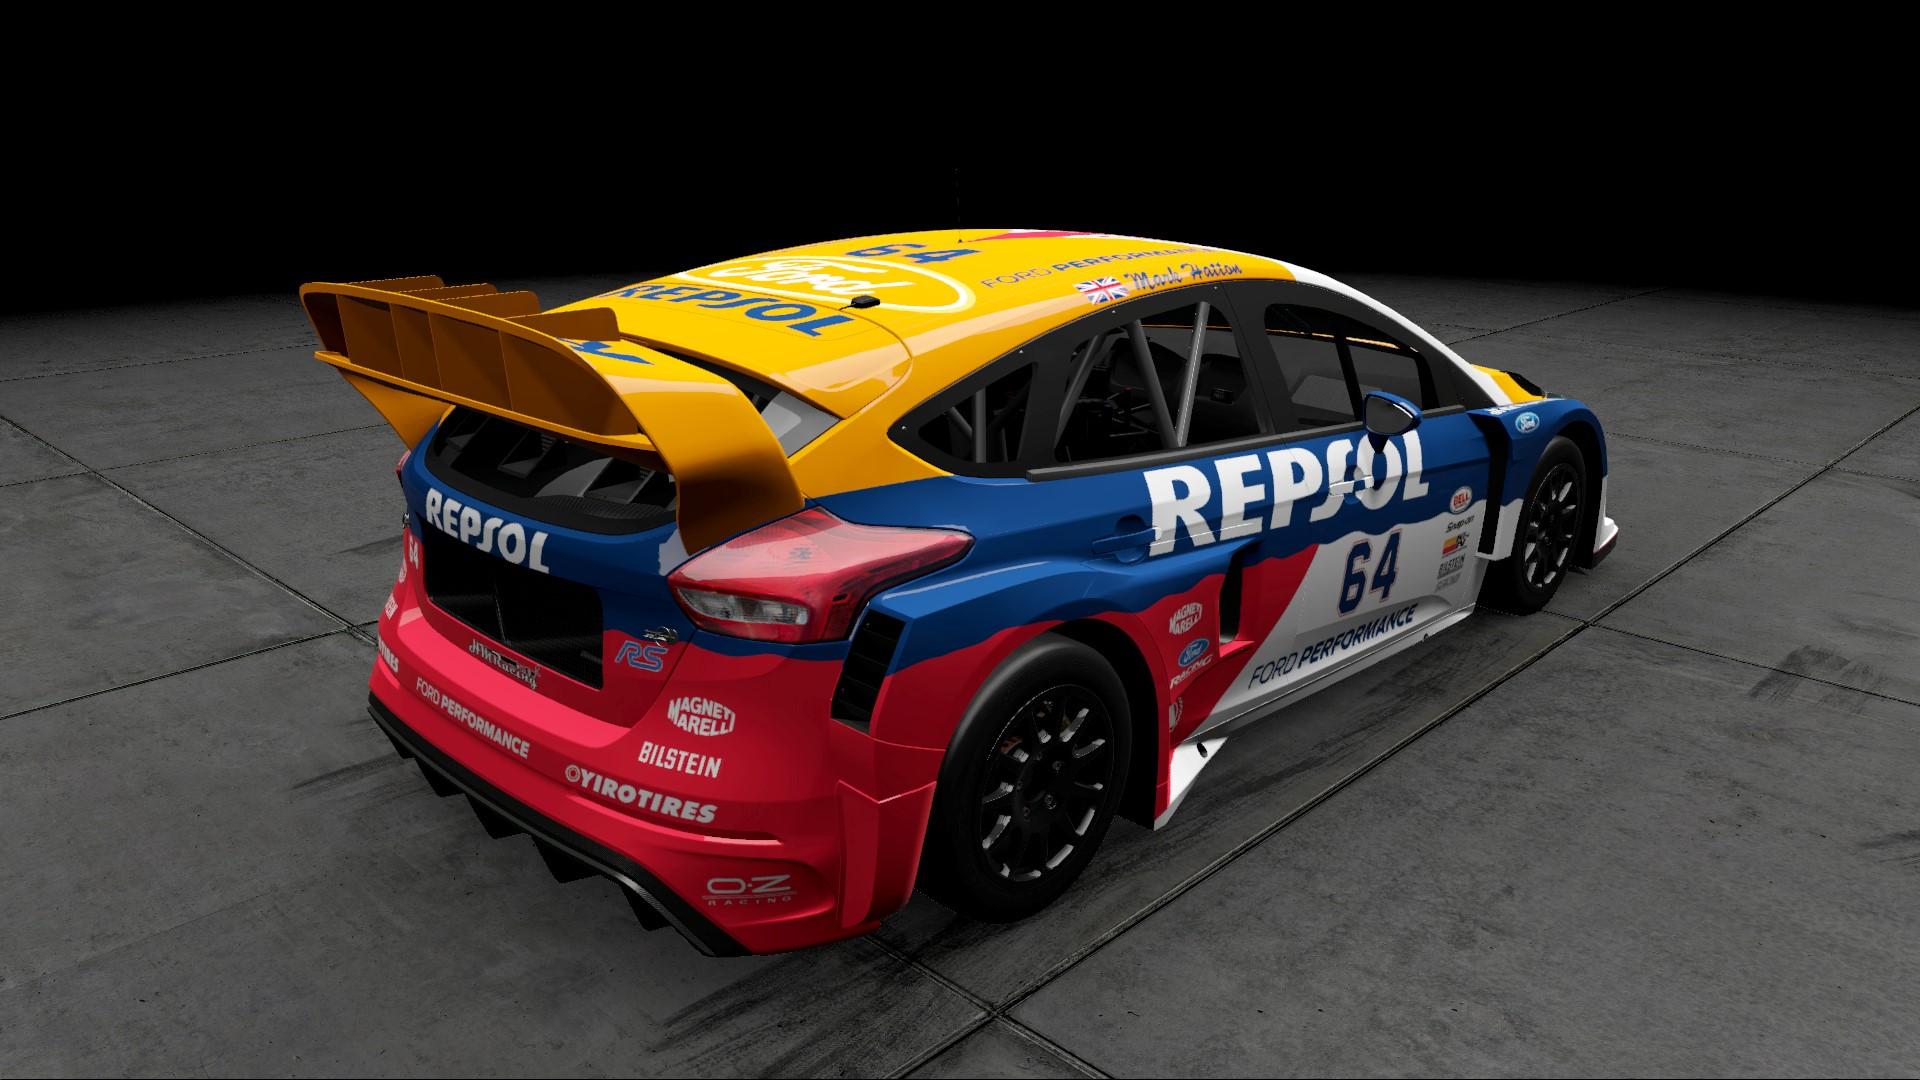 Repsol Ford Focus RX 02.jpg